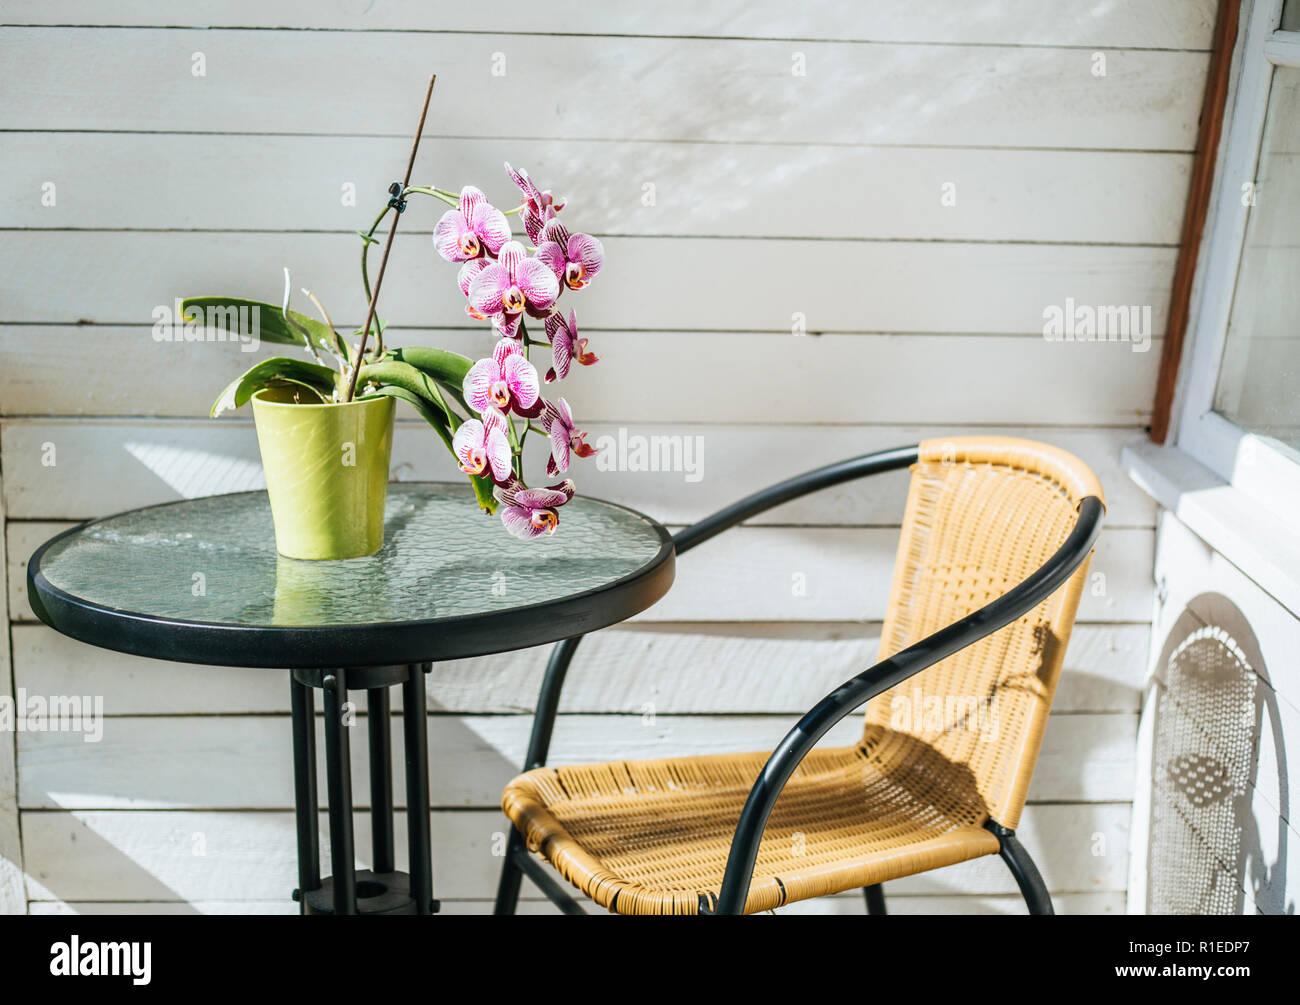 Reguitti Tavoli Da Giardino.Tavoli Da Giardino In Legno Bianco Tavolo Da Giardino Emu Mobili